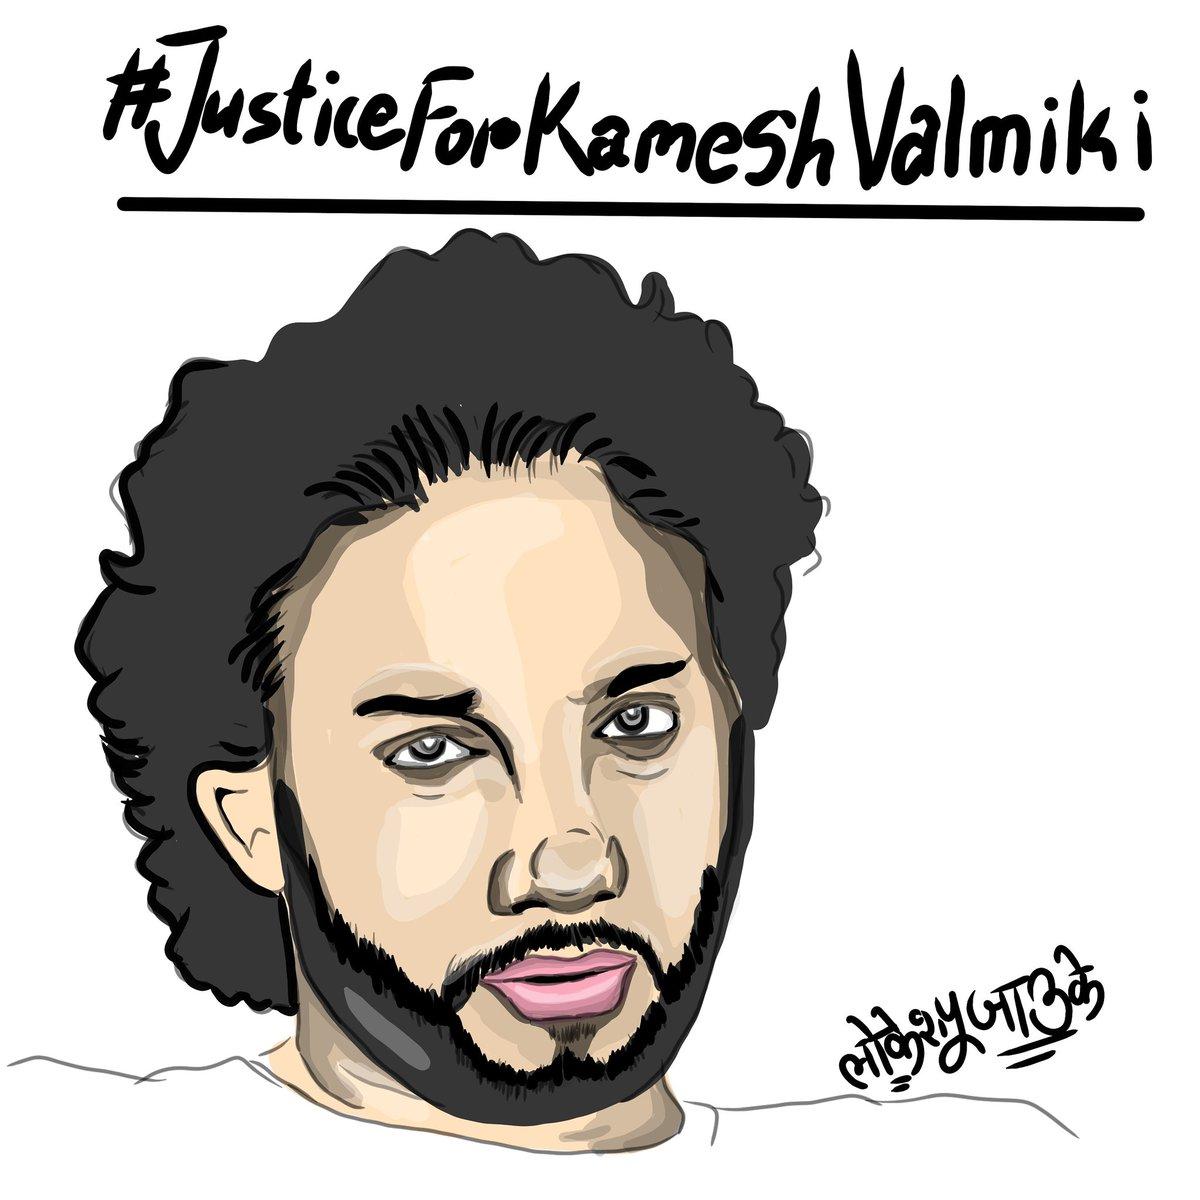 पढ़ो,तुम्हारी सूखी रोटी गिद्ध लपकते क्यों हैं. पूछो, मां-बहनों पर यों बदमाश झपटते क्यों हैं,  लड़ना पढ़ना सीख लो ओ रोज मरने वालो.......  #JusticeForKameshValmiki @amarvalmiki91 @Profdilipmandal @HansrajMeena @lyricshitposts @rajat_lohat @HimanshuValmi13 @Sumitchauhaan https://t.co/slqJdQxdek